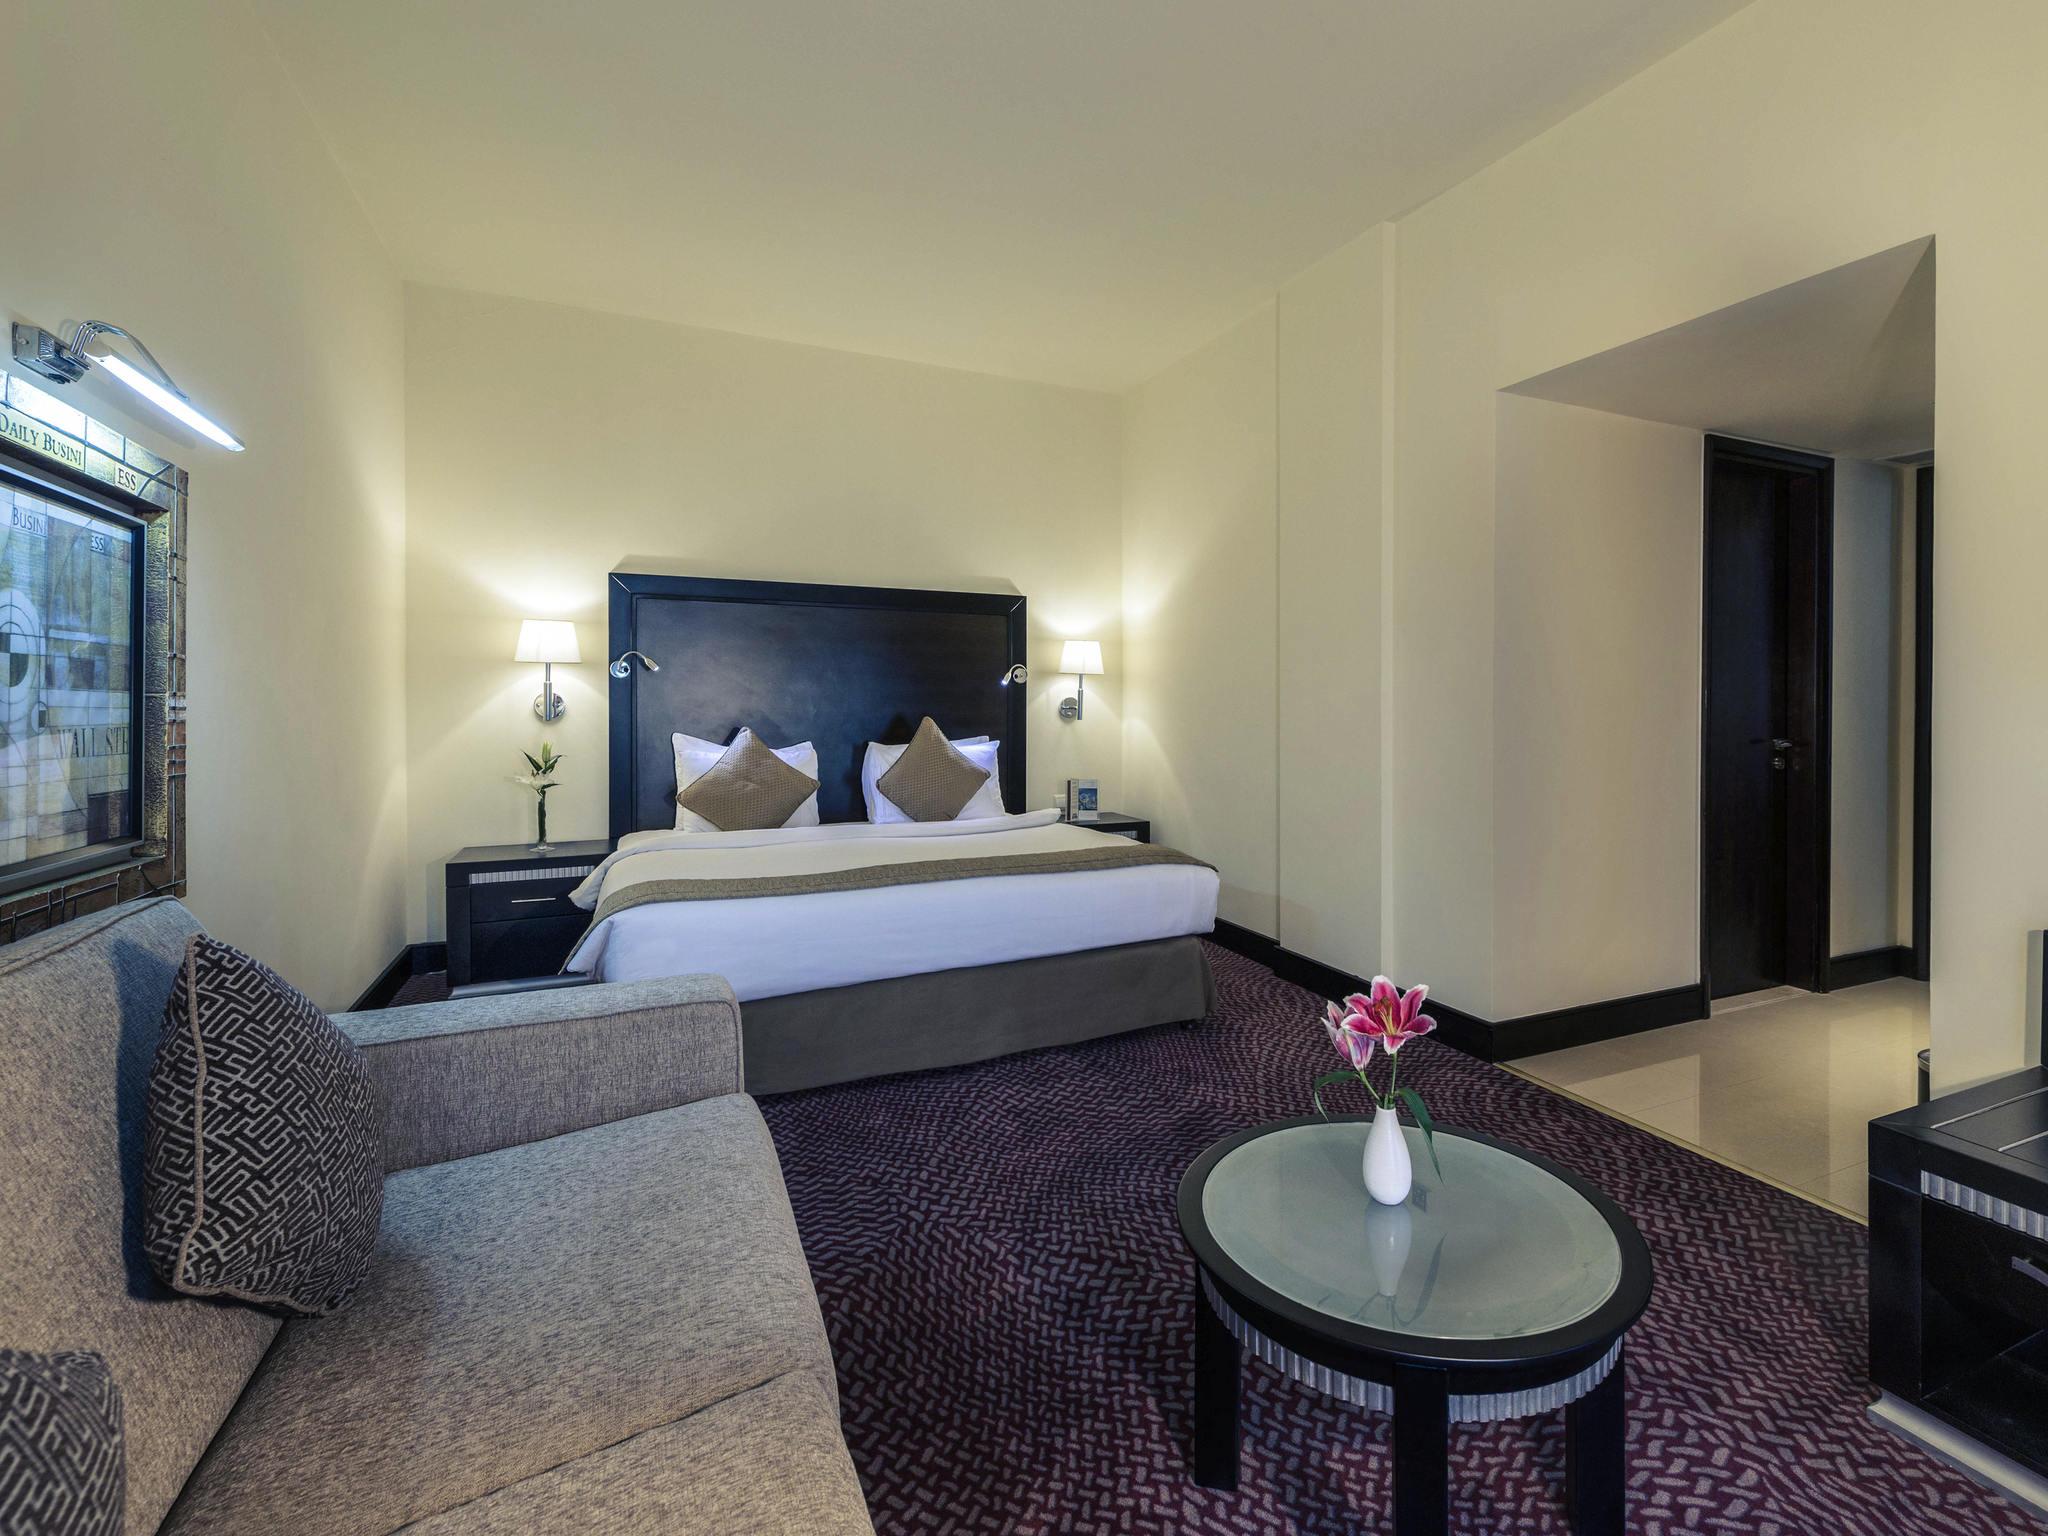 100 royal furniture madina mall best price on rove al